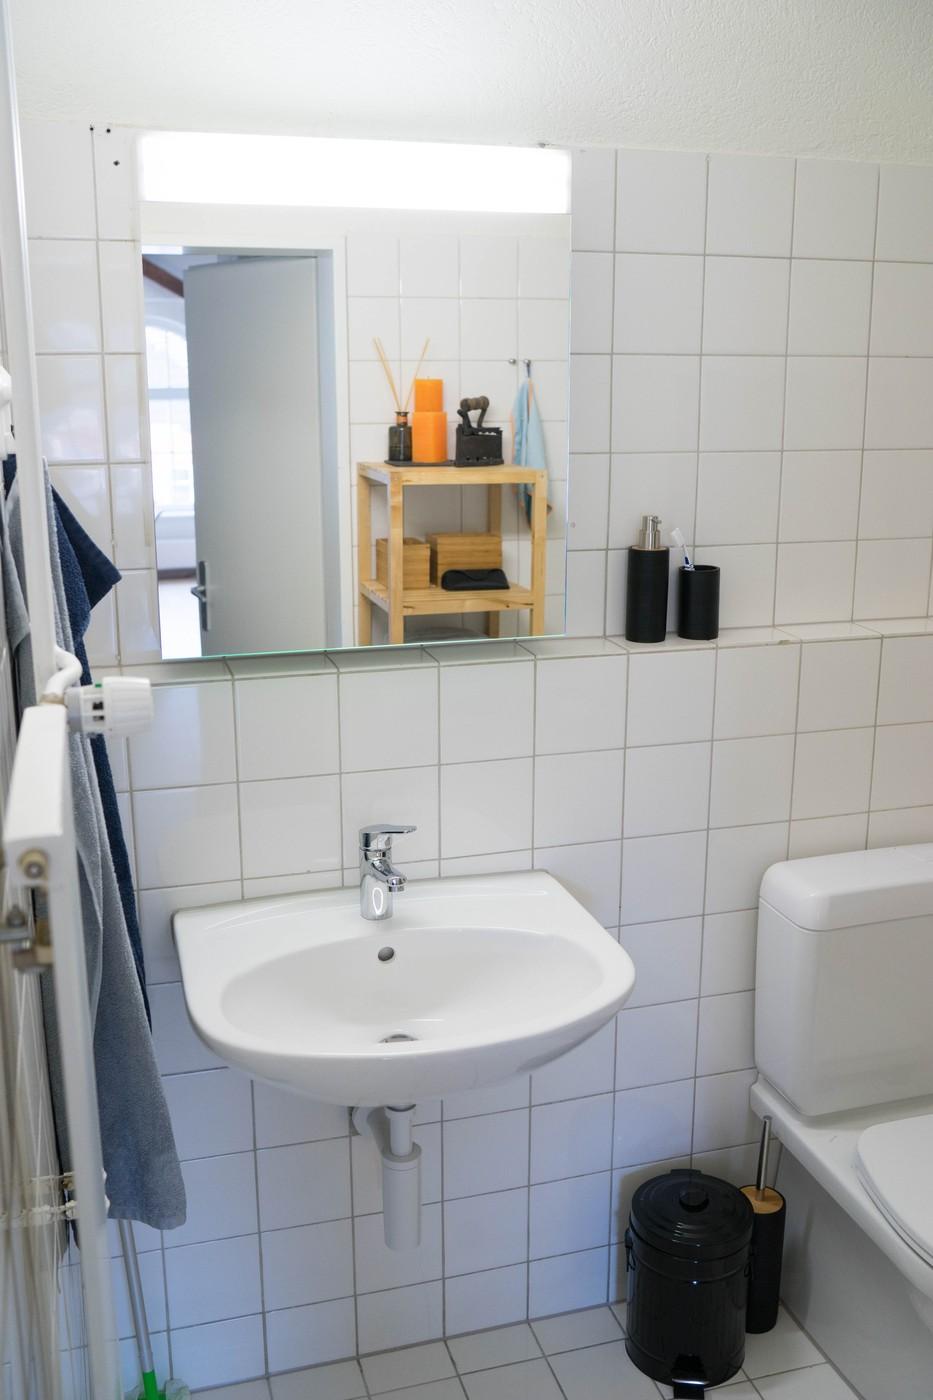 3 zimmer wohnung in st. gallen mieten | flatfox, Badezimmer ideen